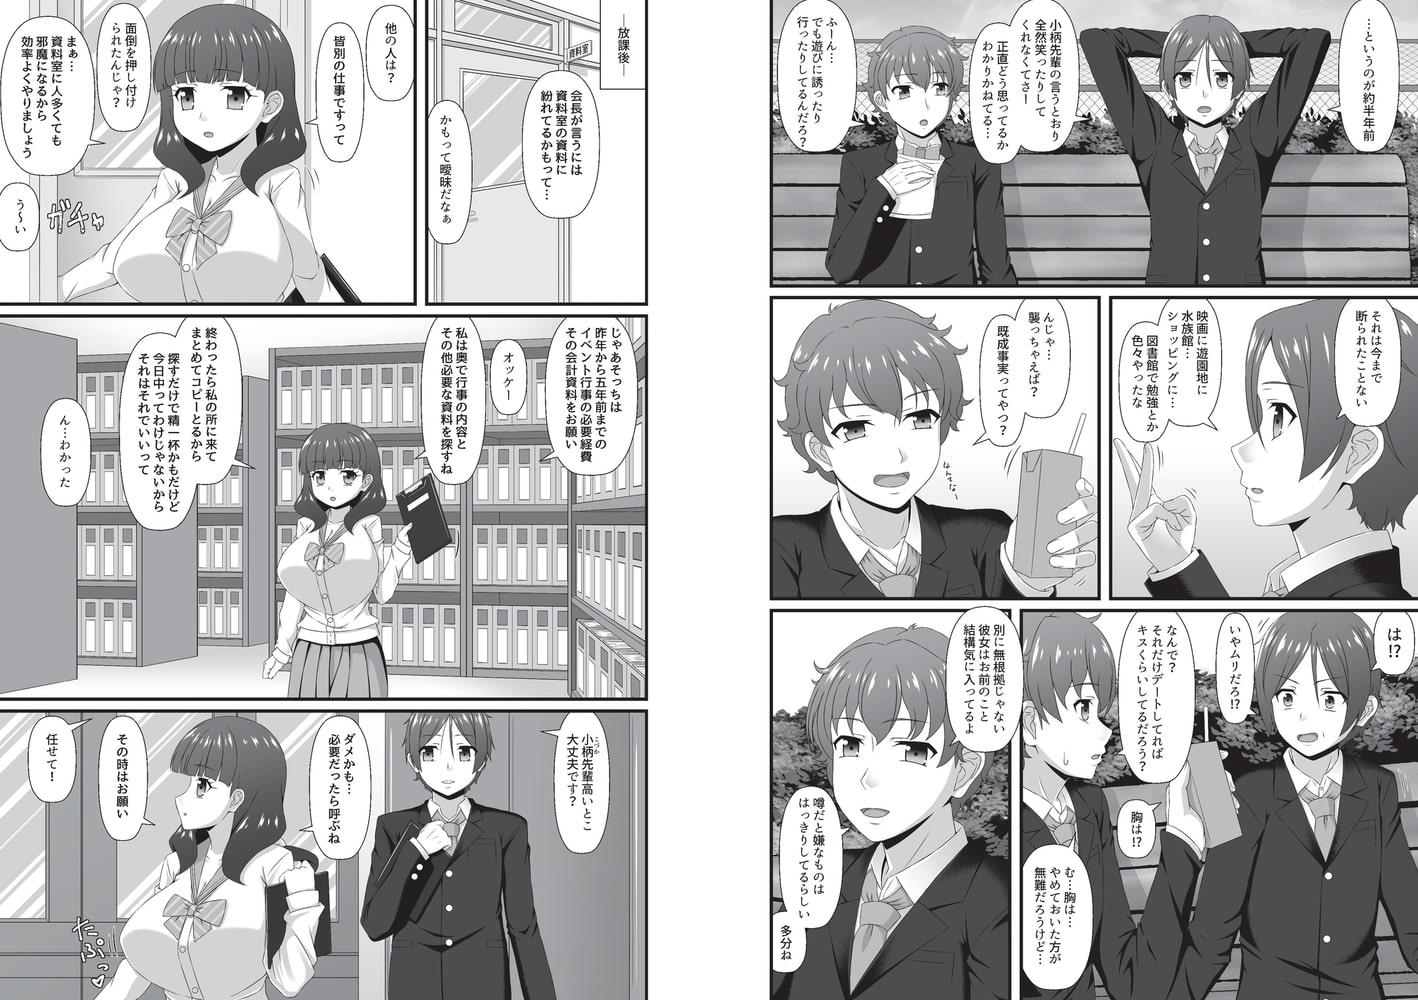 COMIC阿吽 改 Vol.3